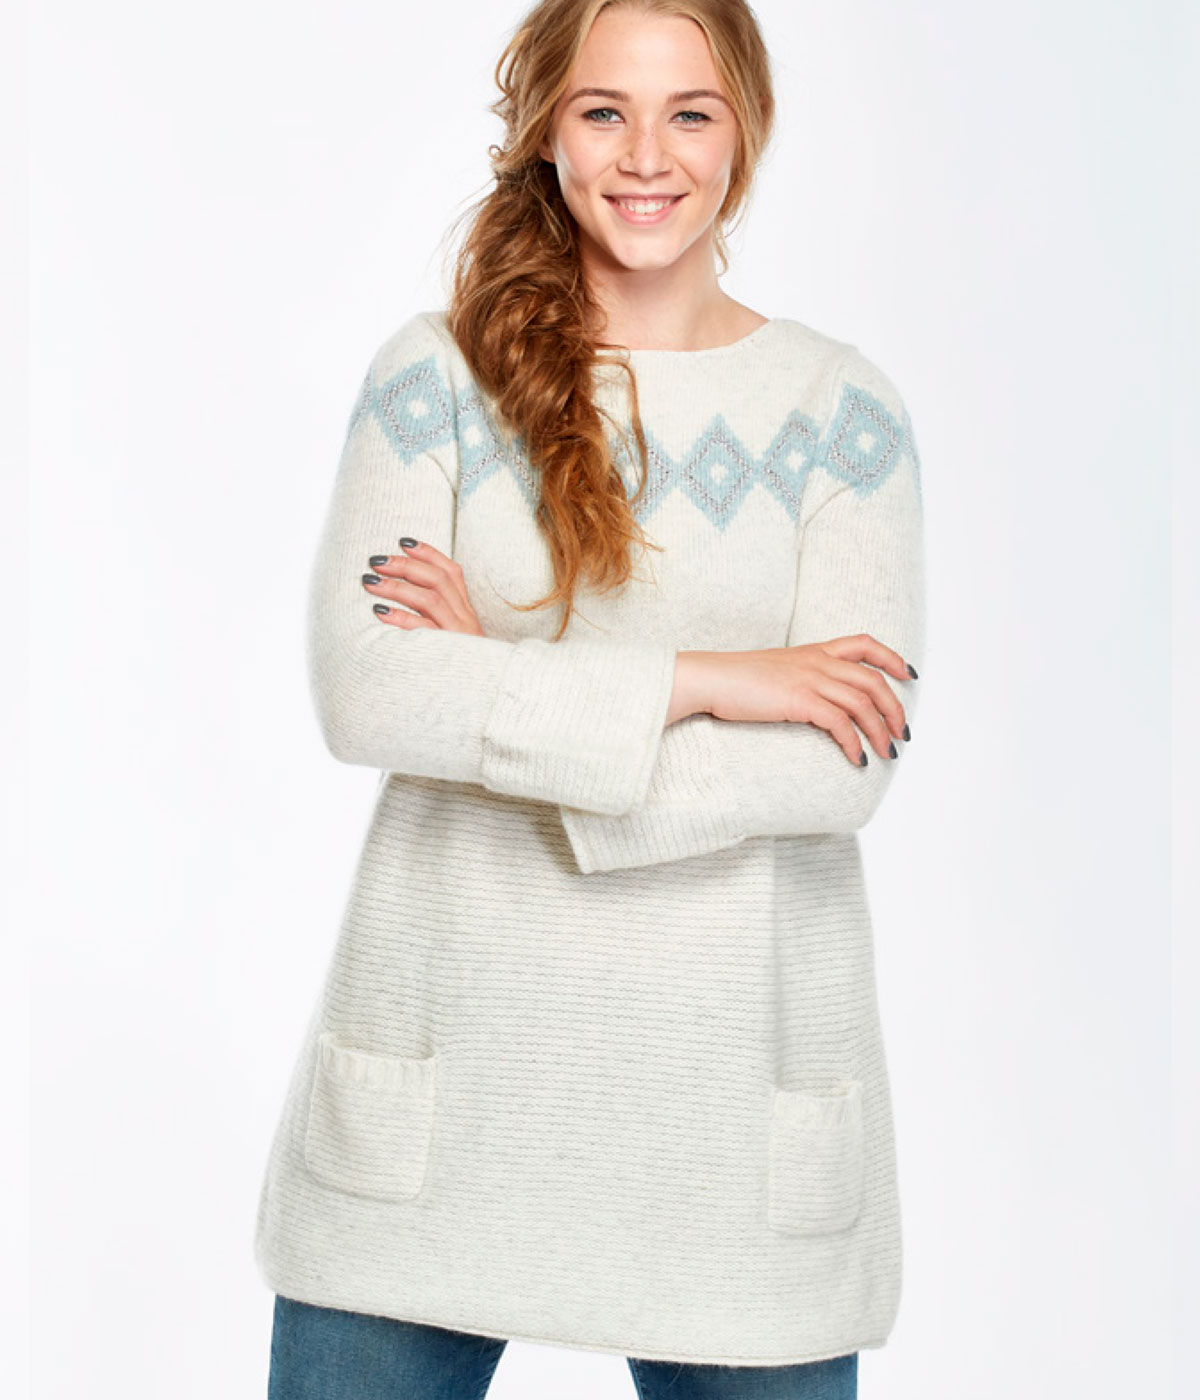 freyju-kjoll